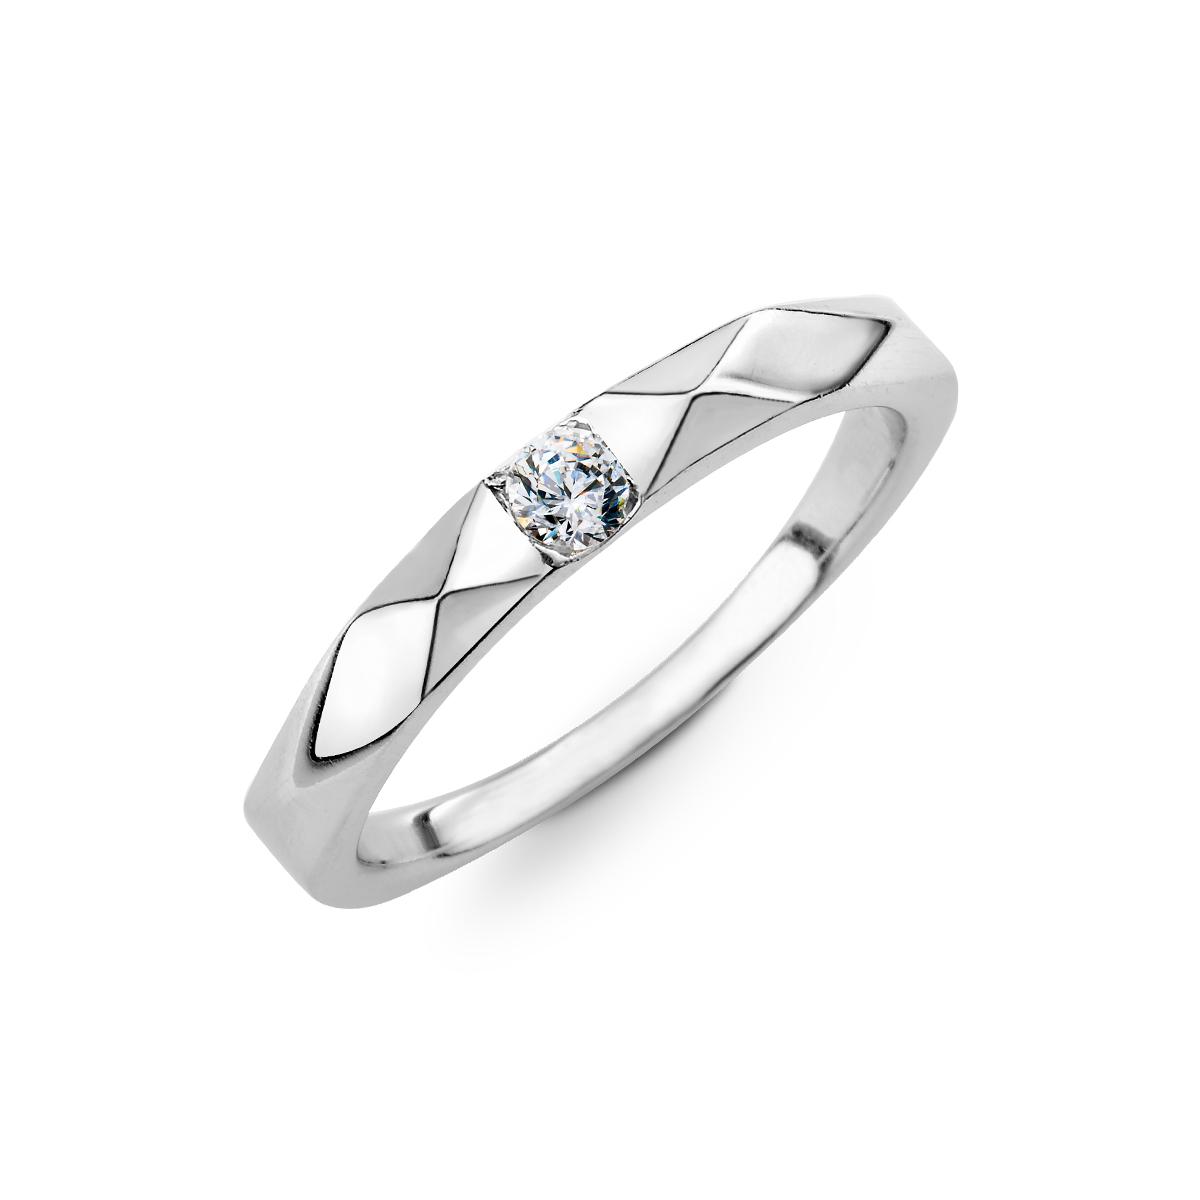 KSW294 菱形面單鑽戒指